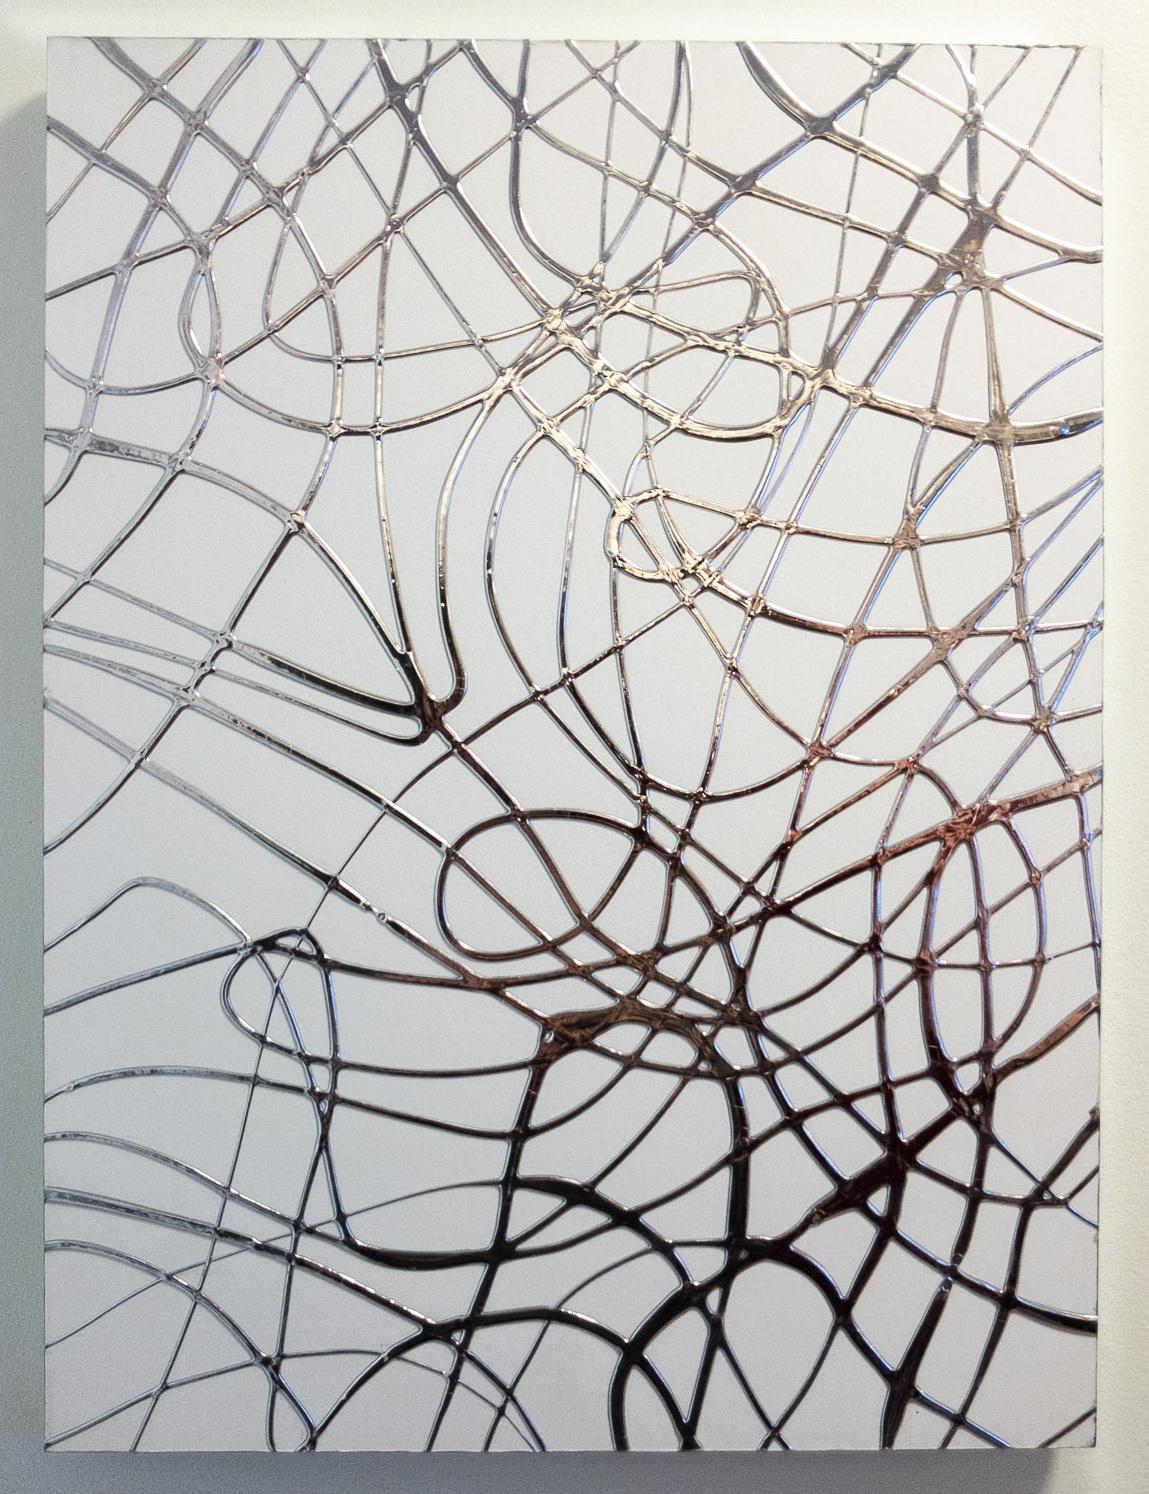 mclark_artwork_web_sold-11.jpg